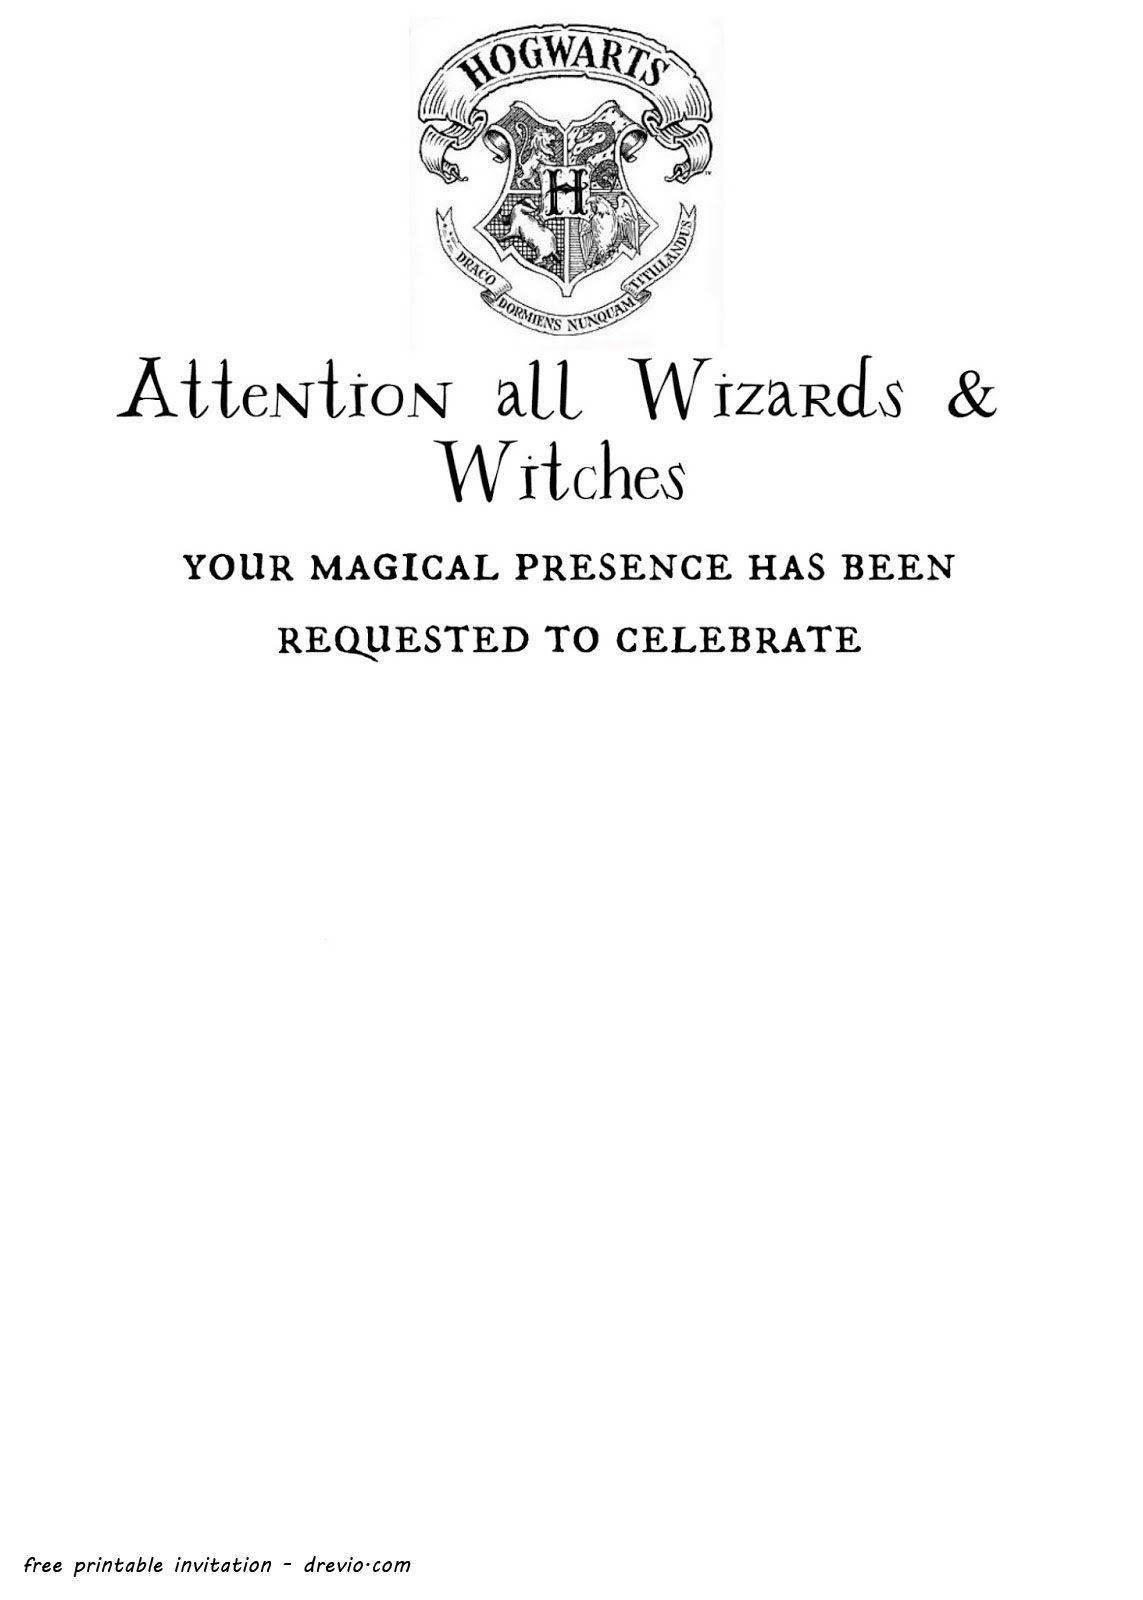 Free Printable Harry Potter - Hogwarts Invitation Template | Harry - Harry Potter Birthday Invitations Free Printable